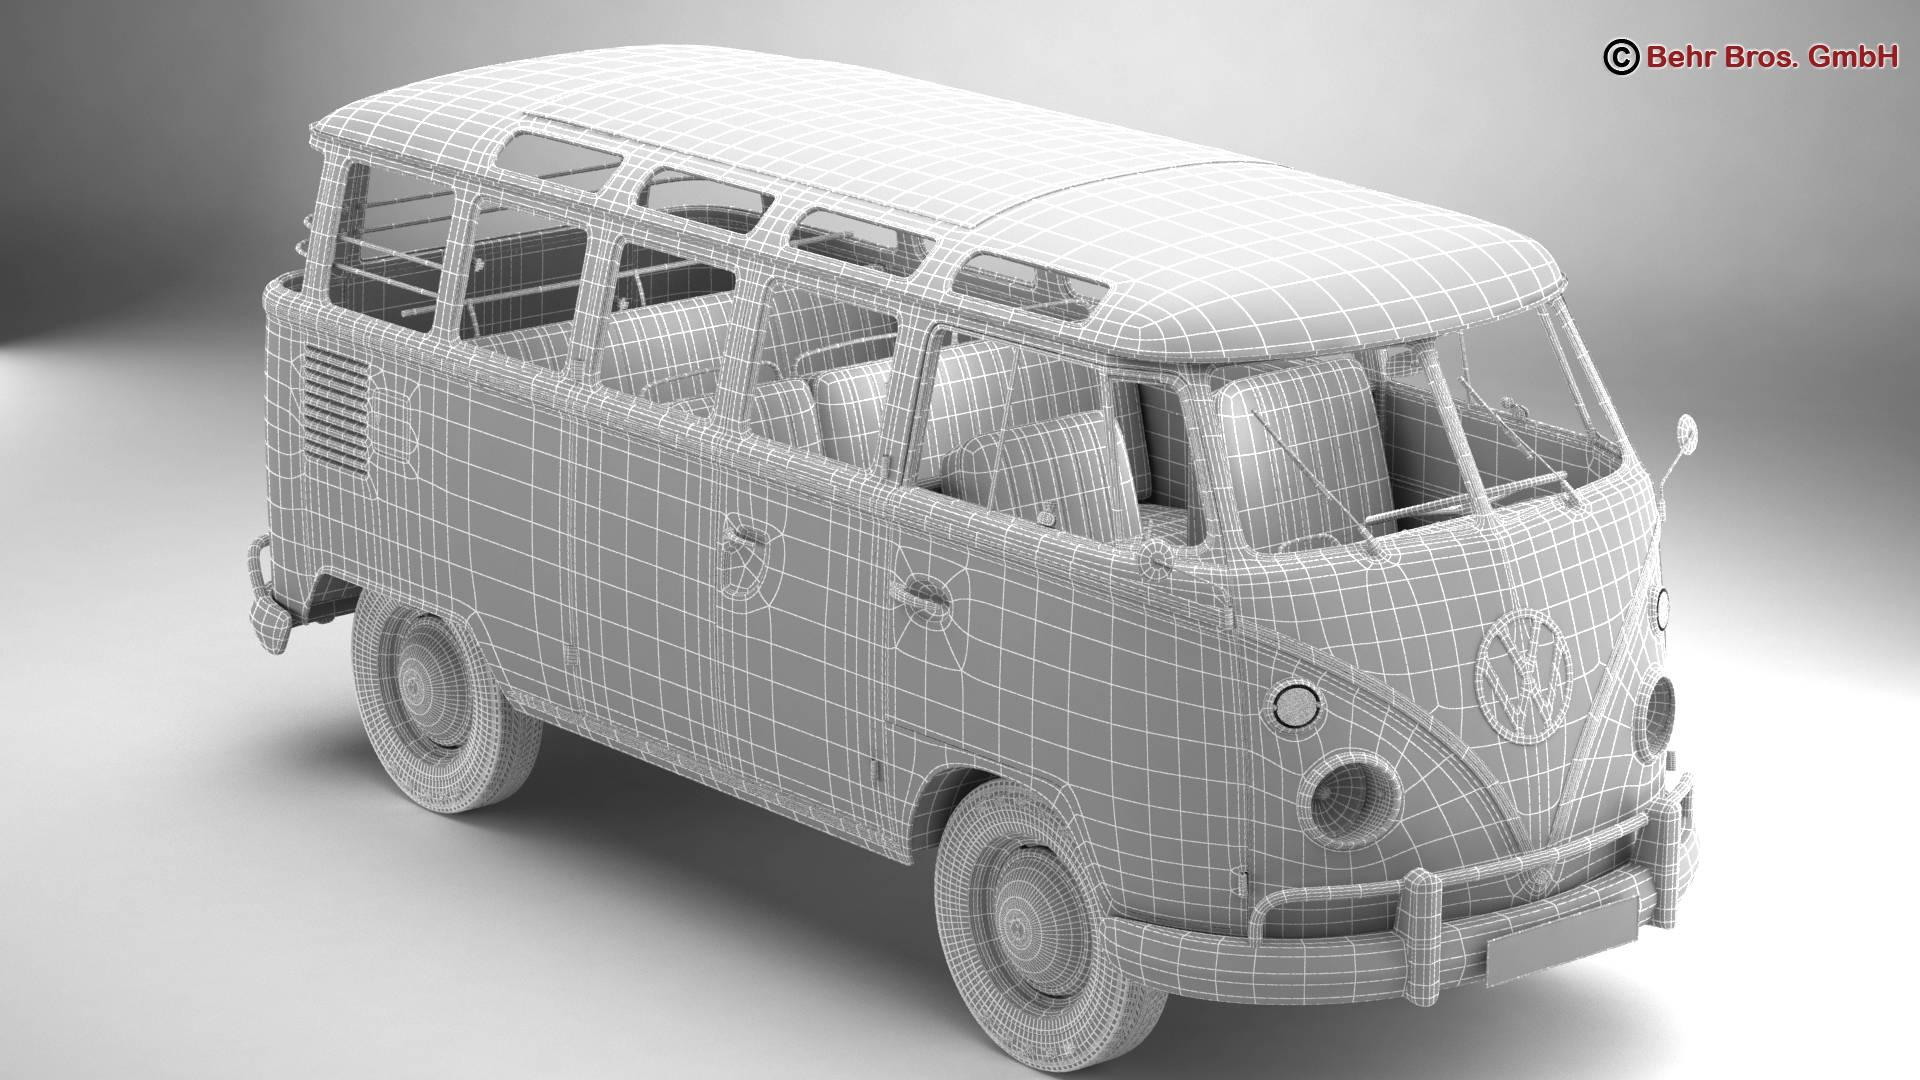 volkswagen type 2 samba 1963 hippie 3d model 3ds max fbx c4d lwo ma mb obj 217257